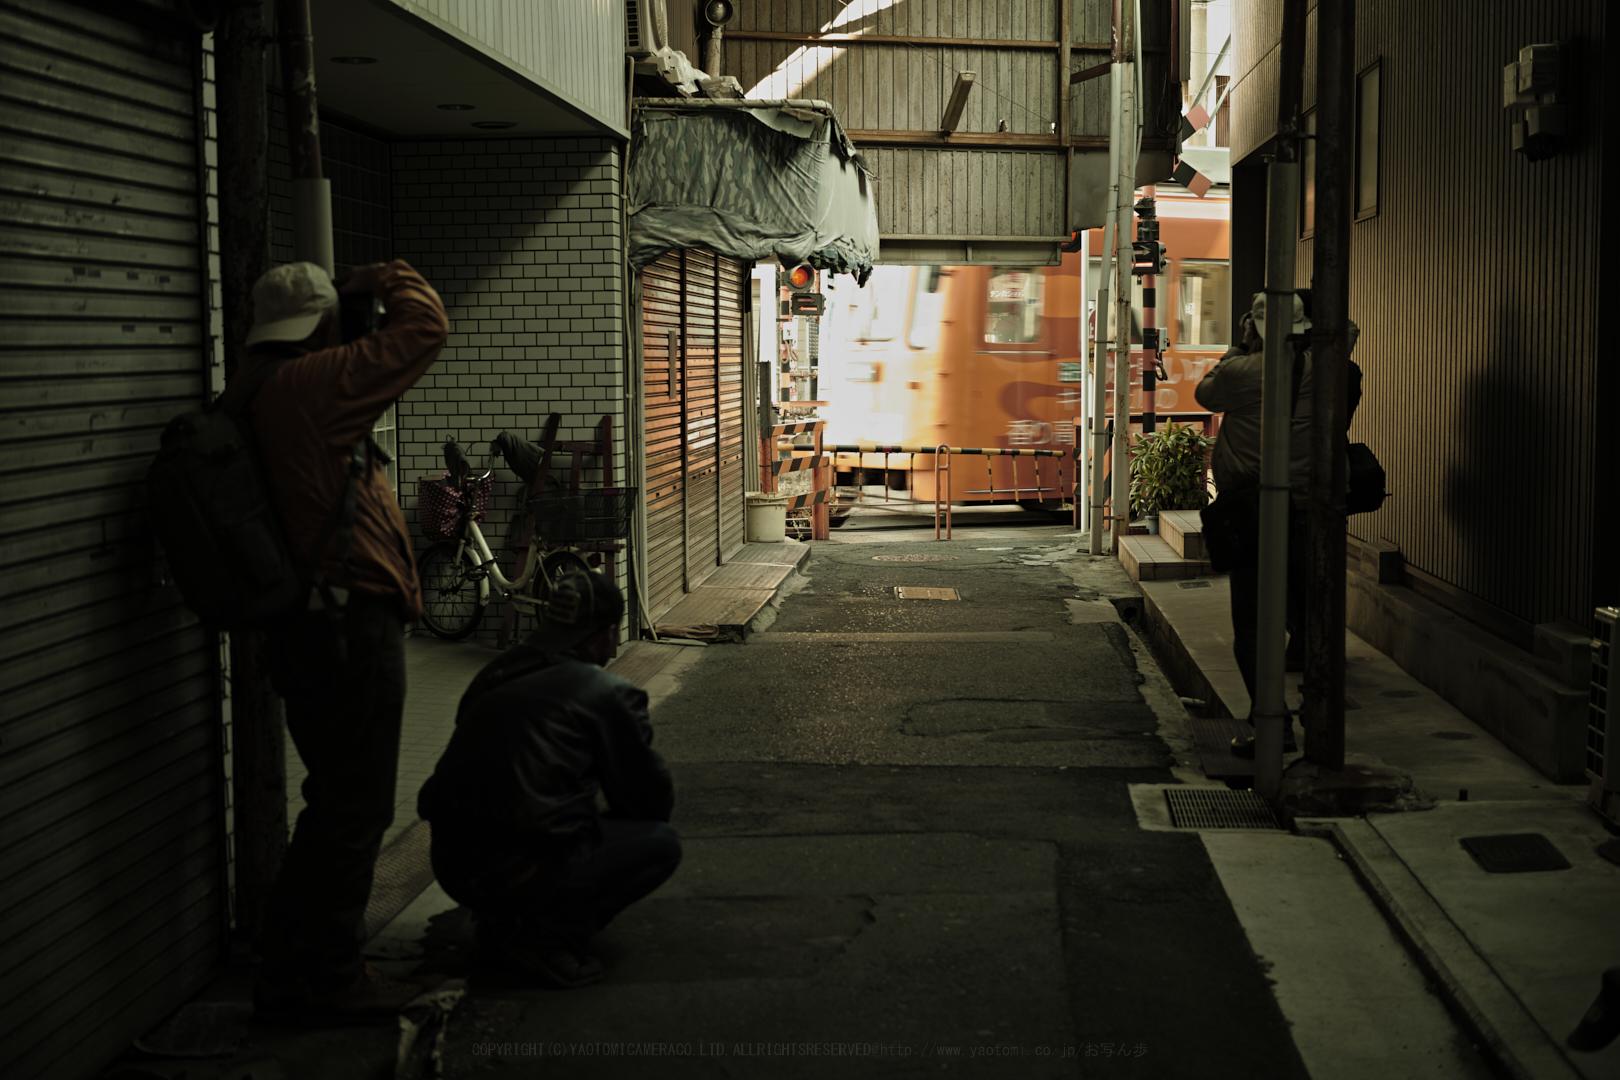 https://www.yaotomi.co.jp/blog/walk/SDIM0672%2C45%20mm%2CF2.8%2Ciso100%20%282%29.jpg